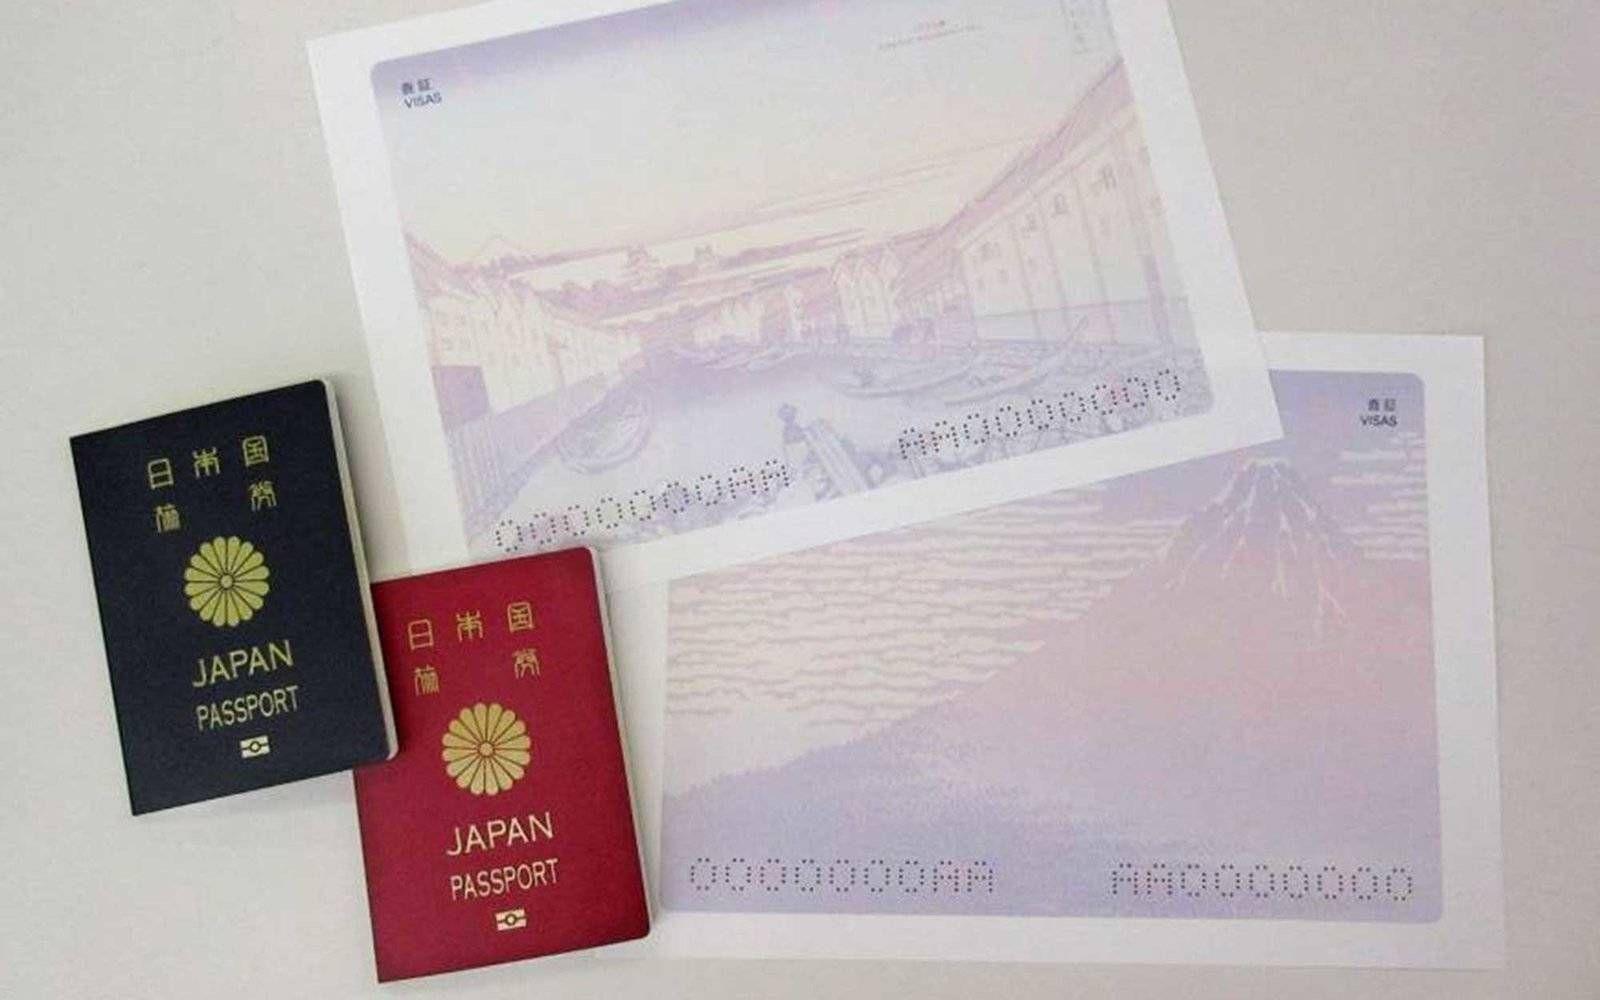 Japan passport